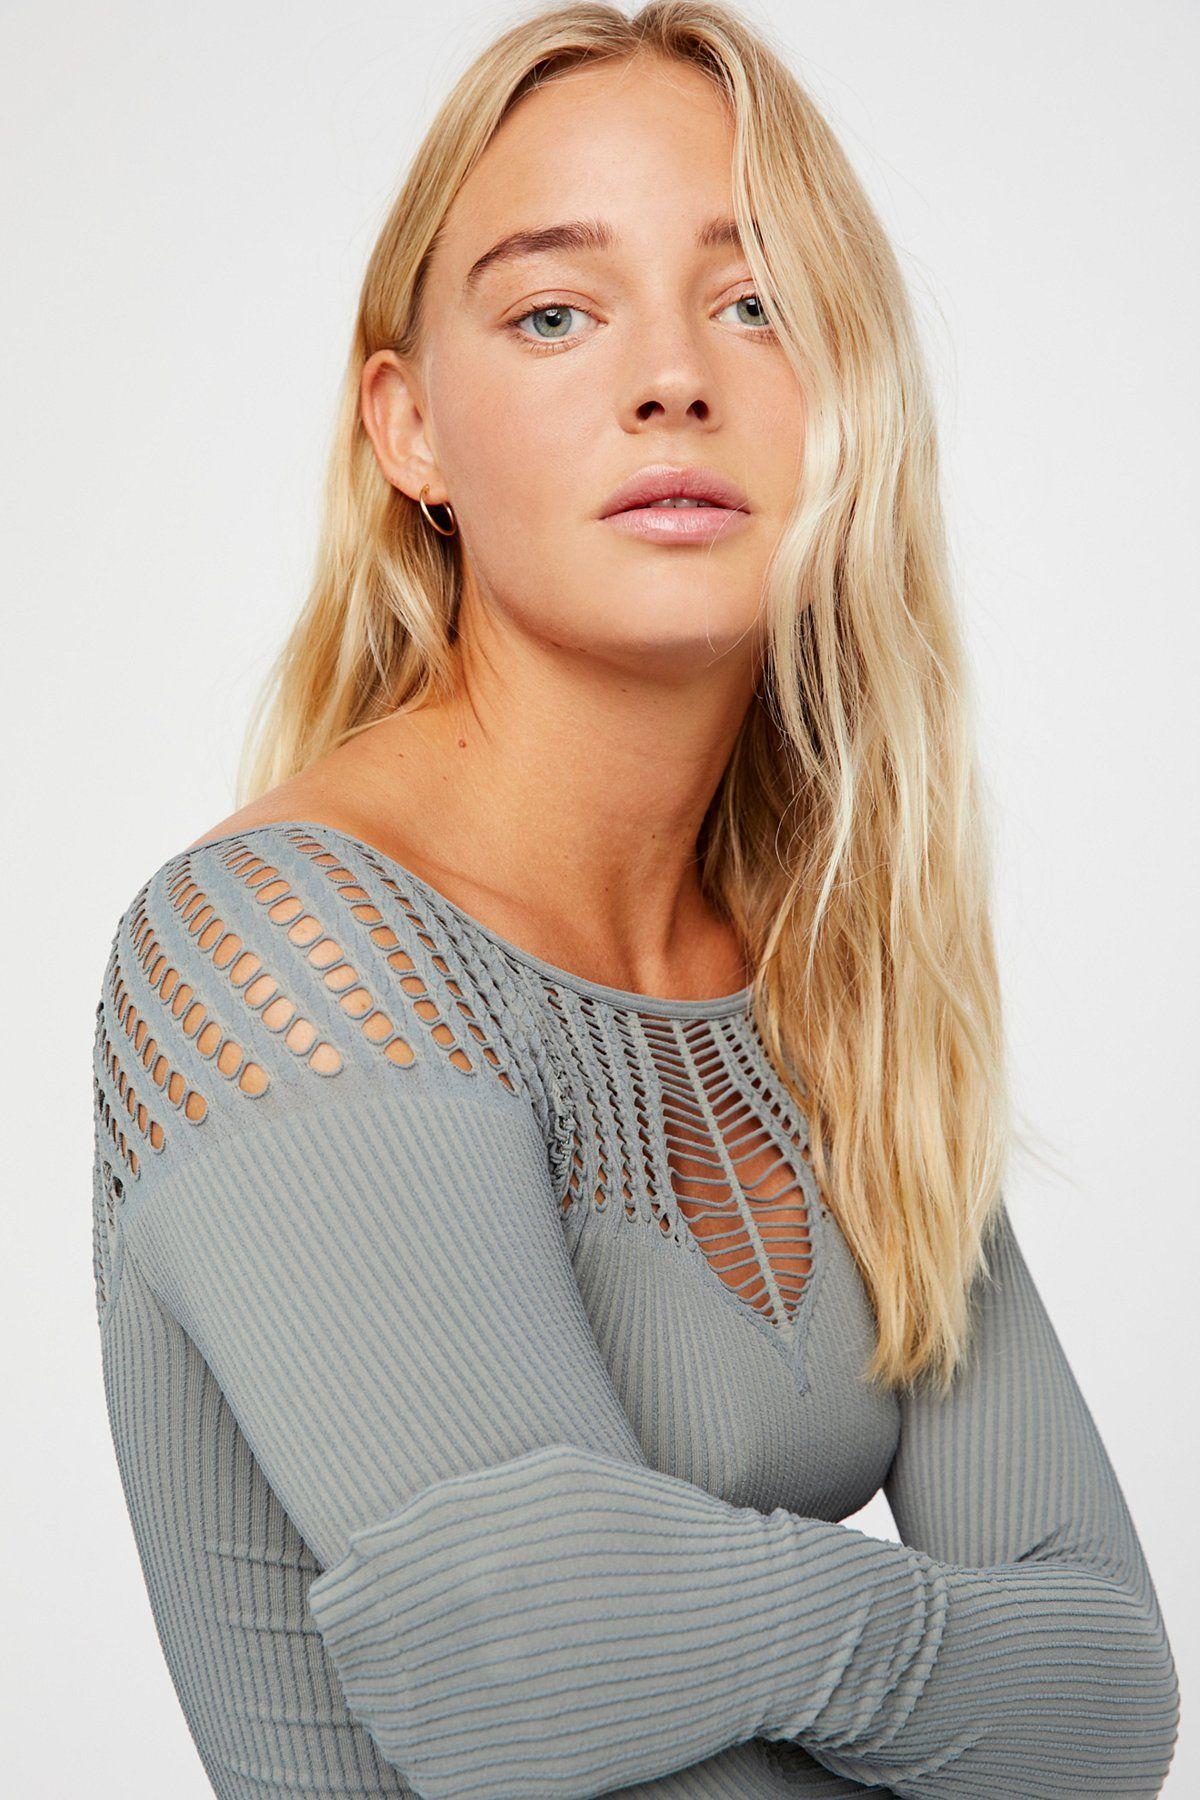 Self-esteem women and intimate wardrobe items